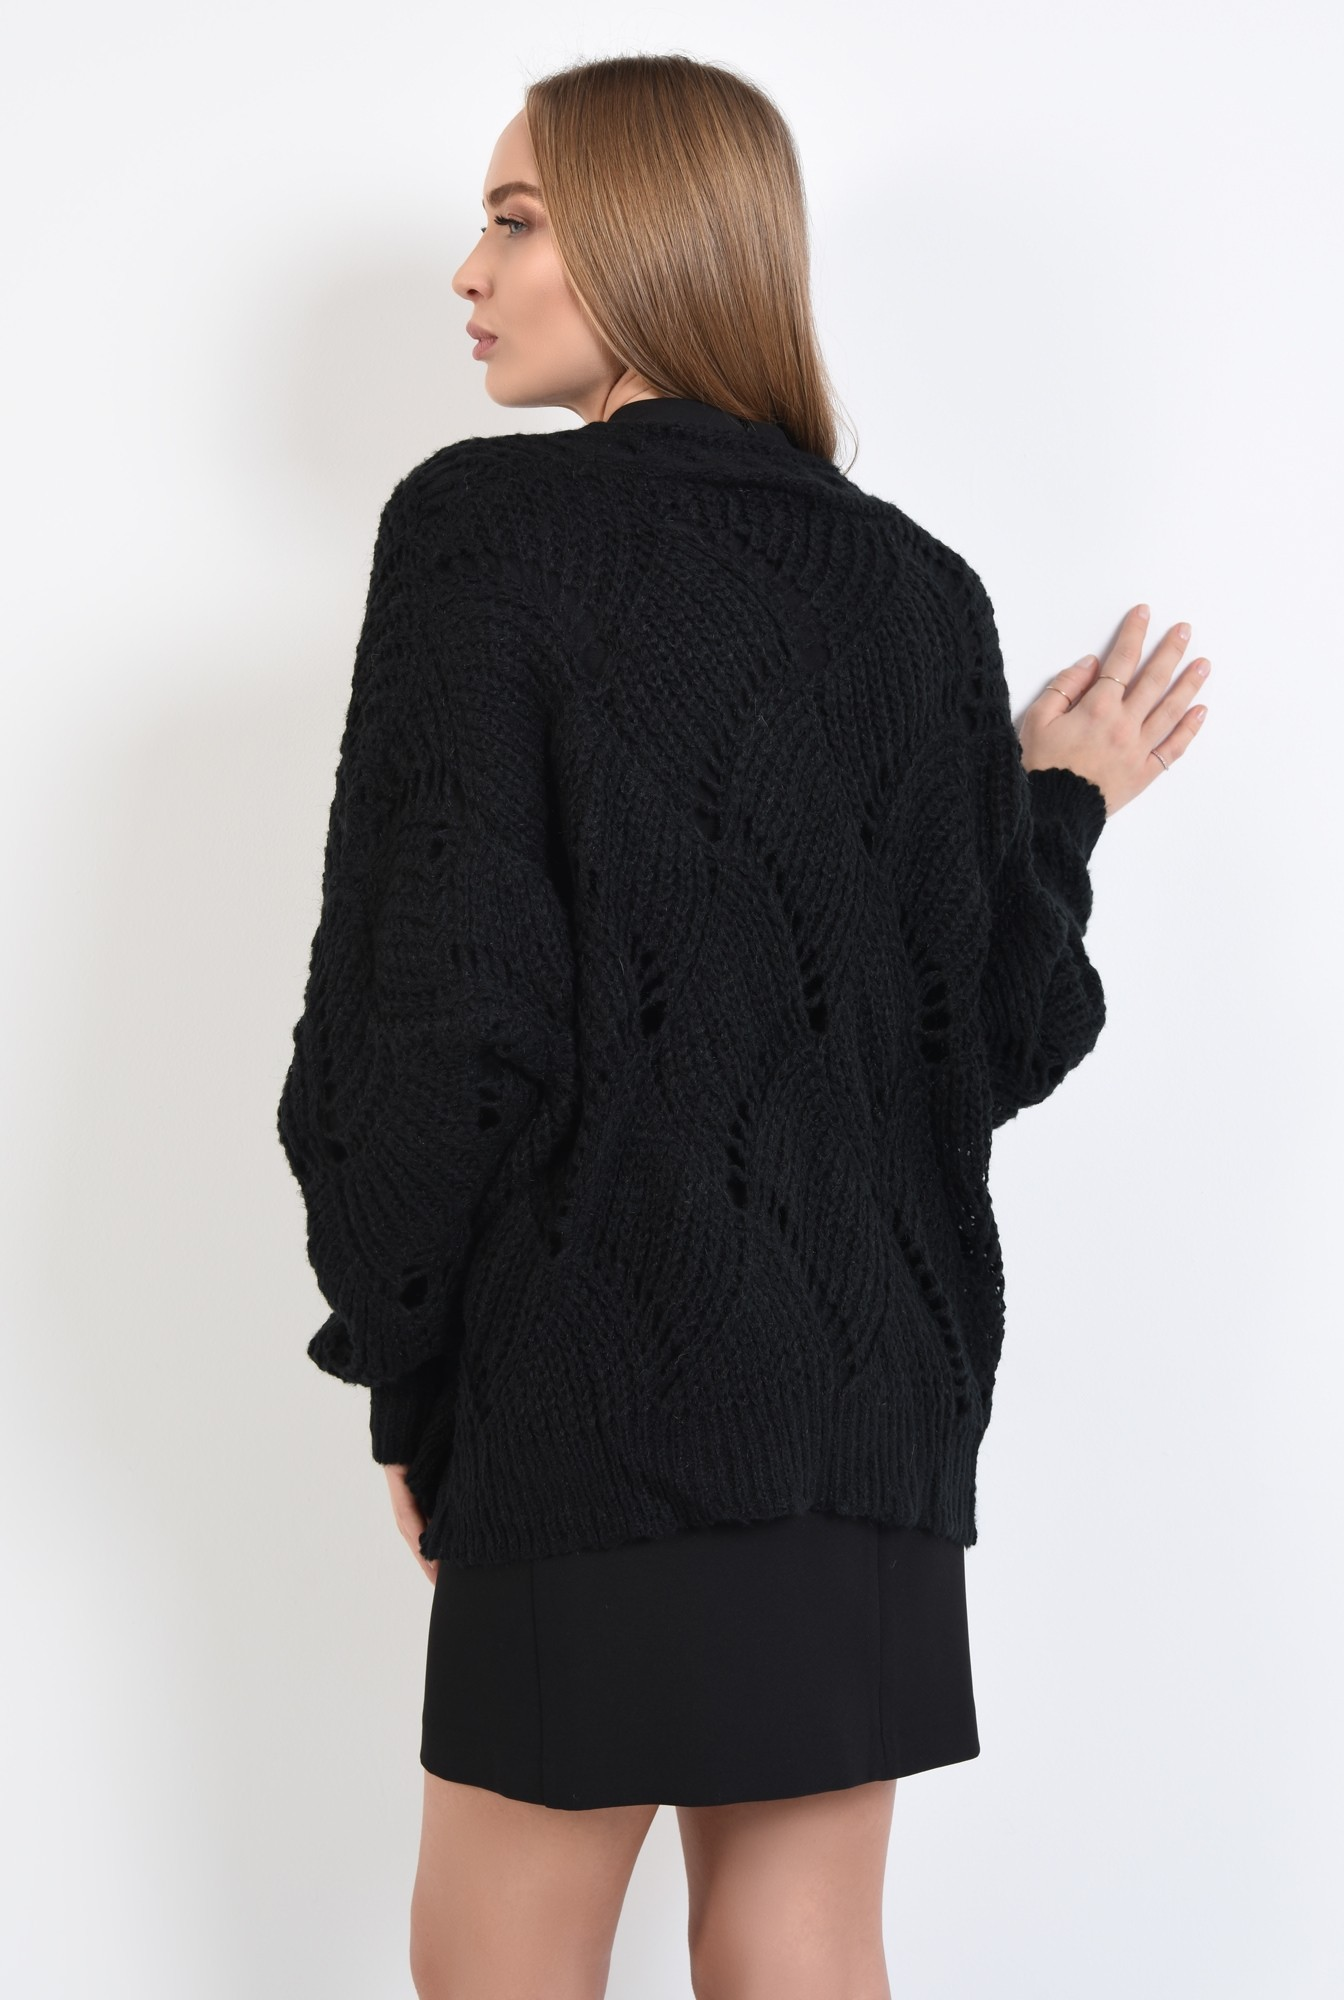 1 - pulover cu gaurele, motive ajurate, maneci bufante, negru